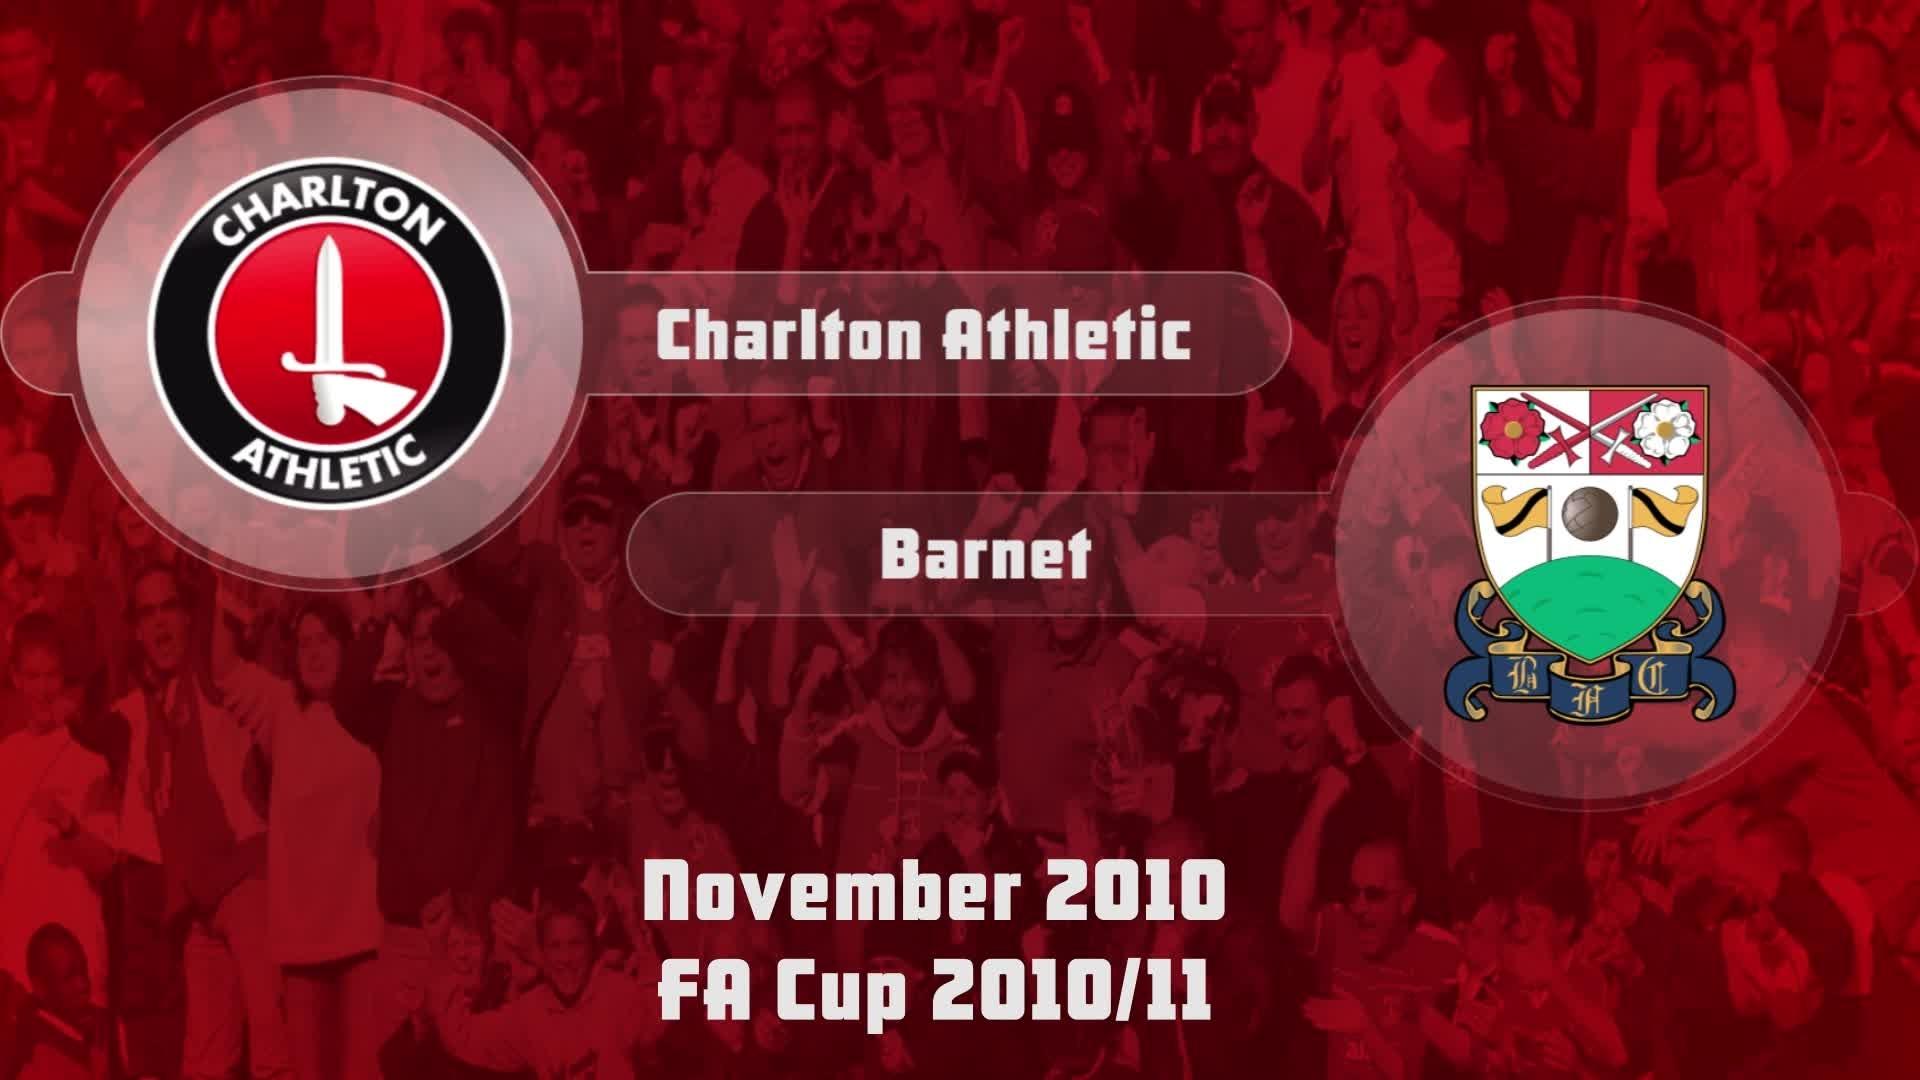 22 HIGHLIGHTS | Charlton 1 Barnet 0 (FA Cup Nov 2010)